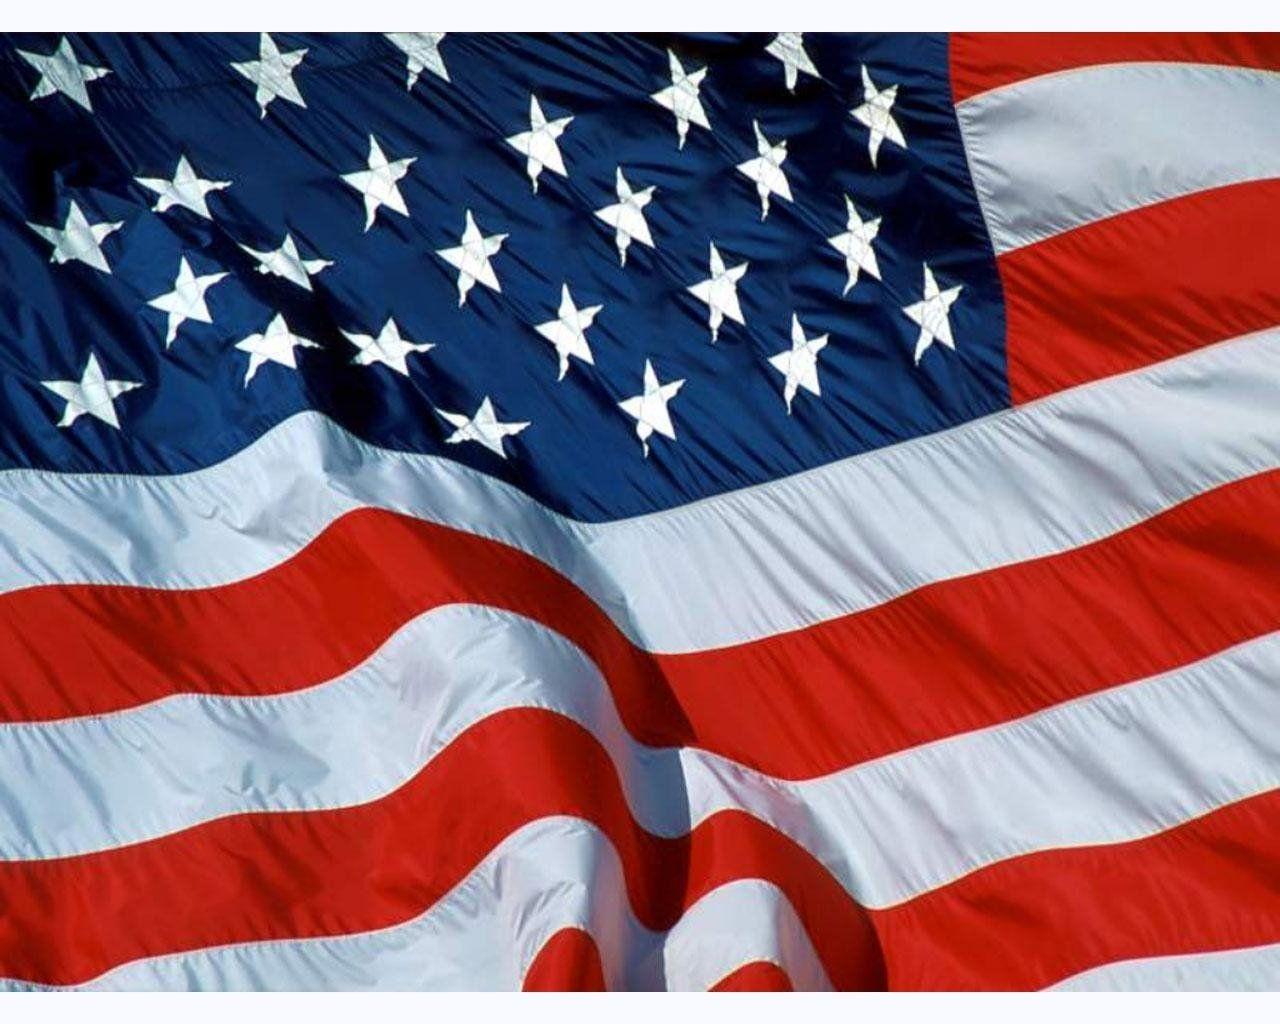 American Flag Wallpapers Wallpaper | HD Wallpapers | Pinterest